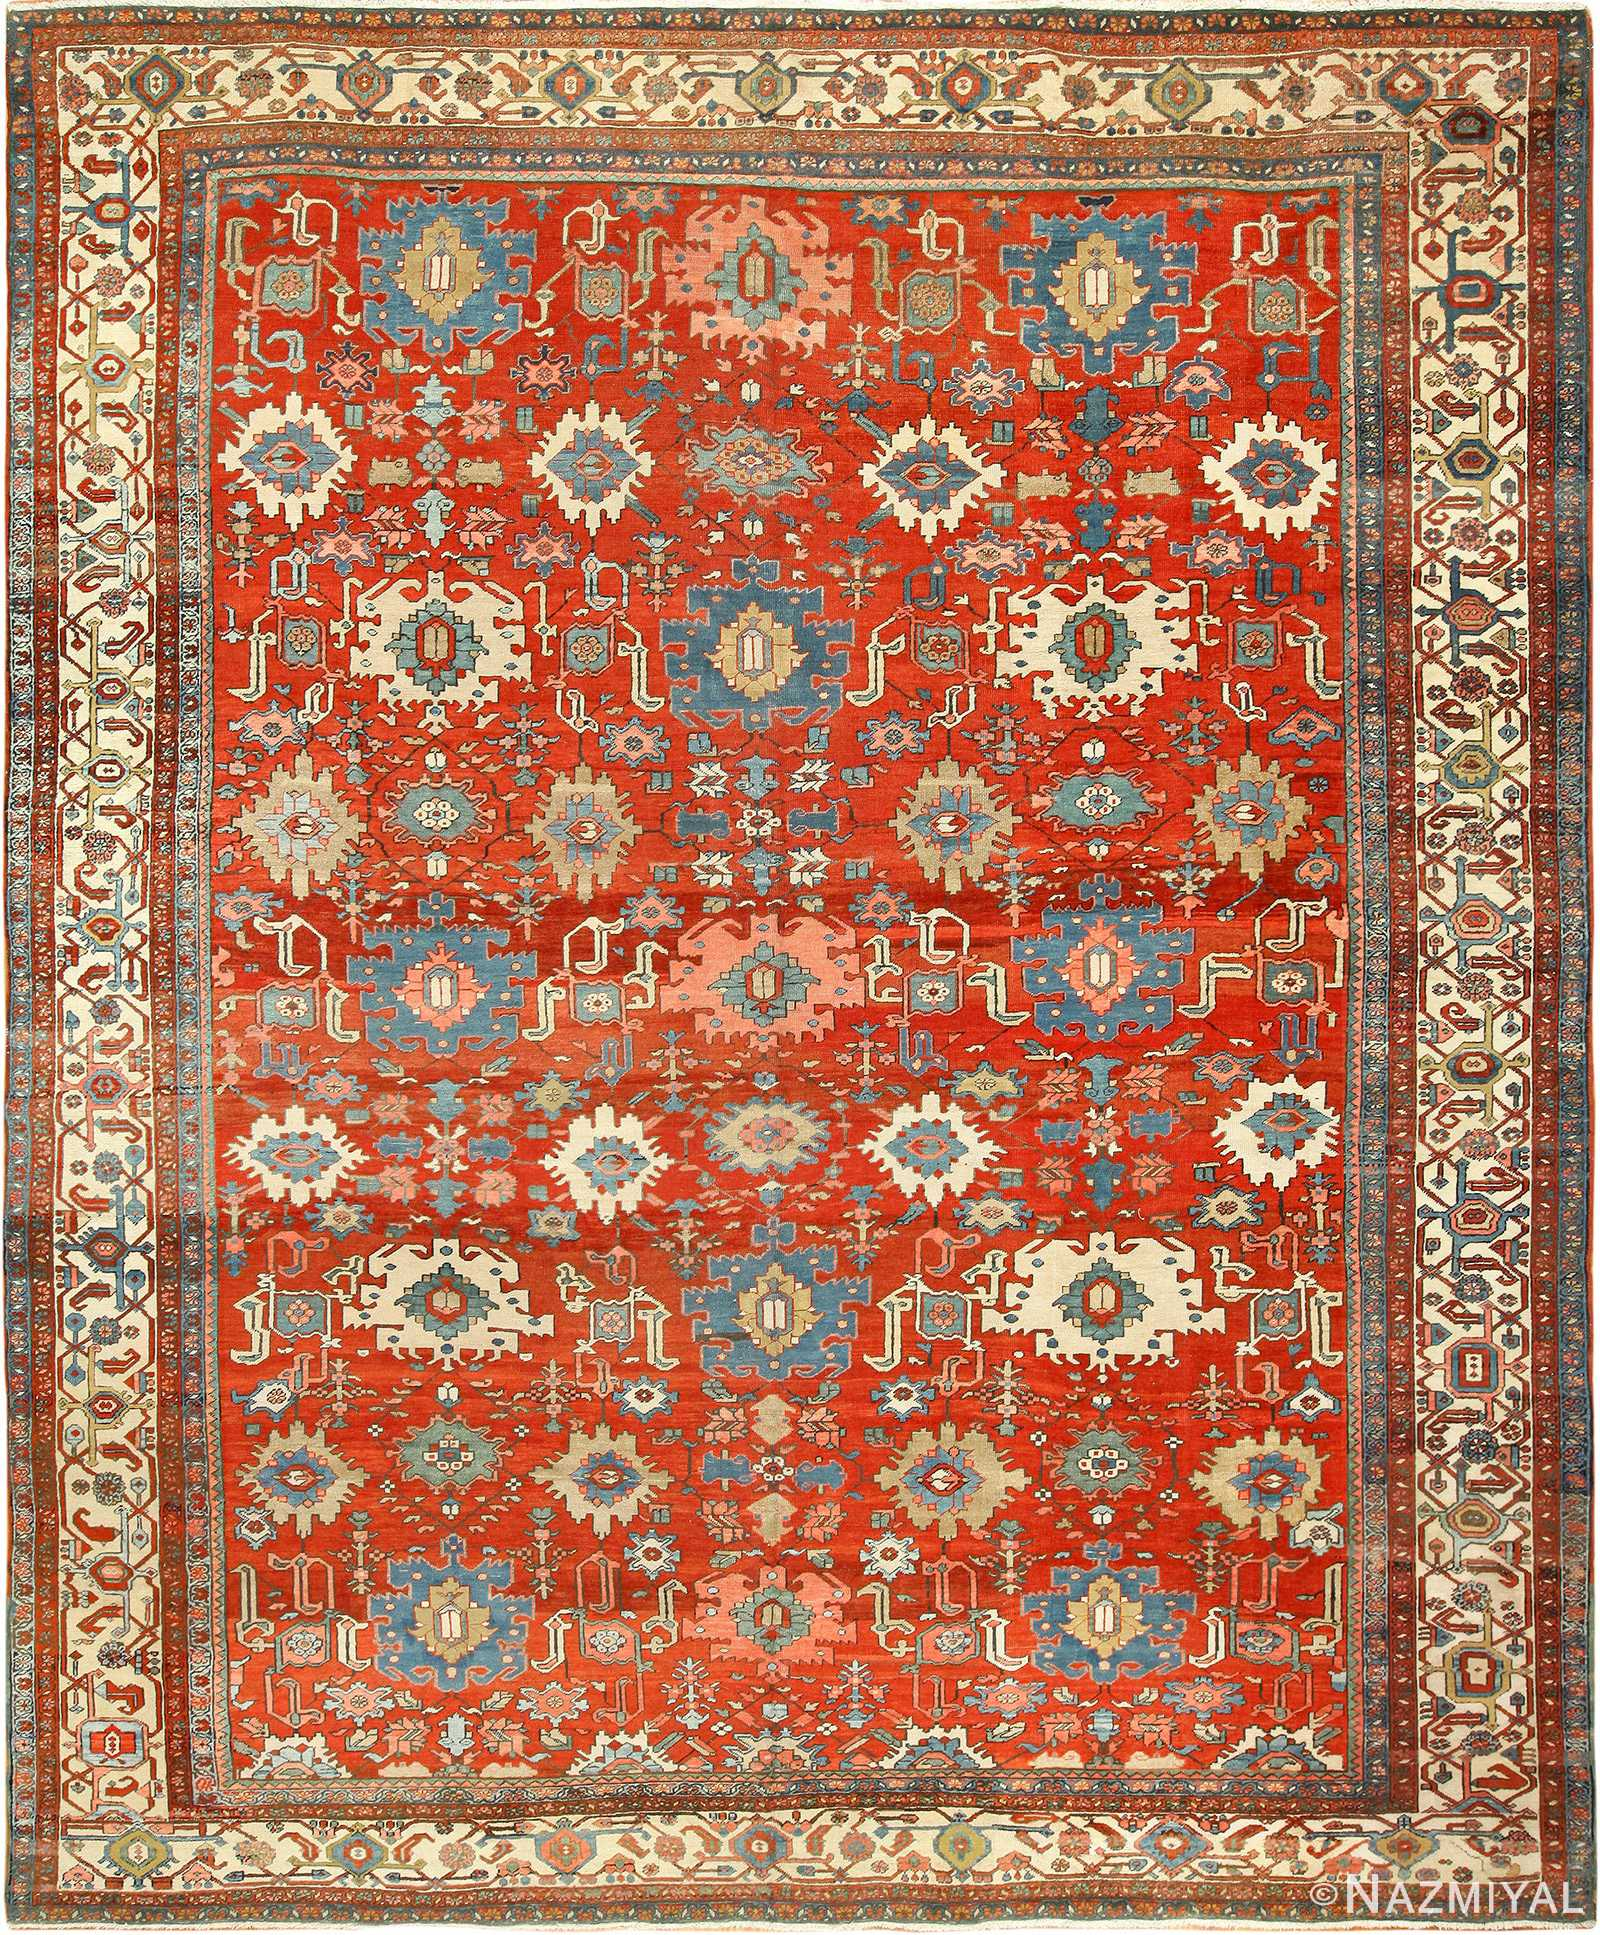 antique red bakshaish persian rug 49393 Nazmiyal